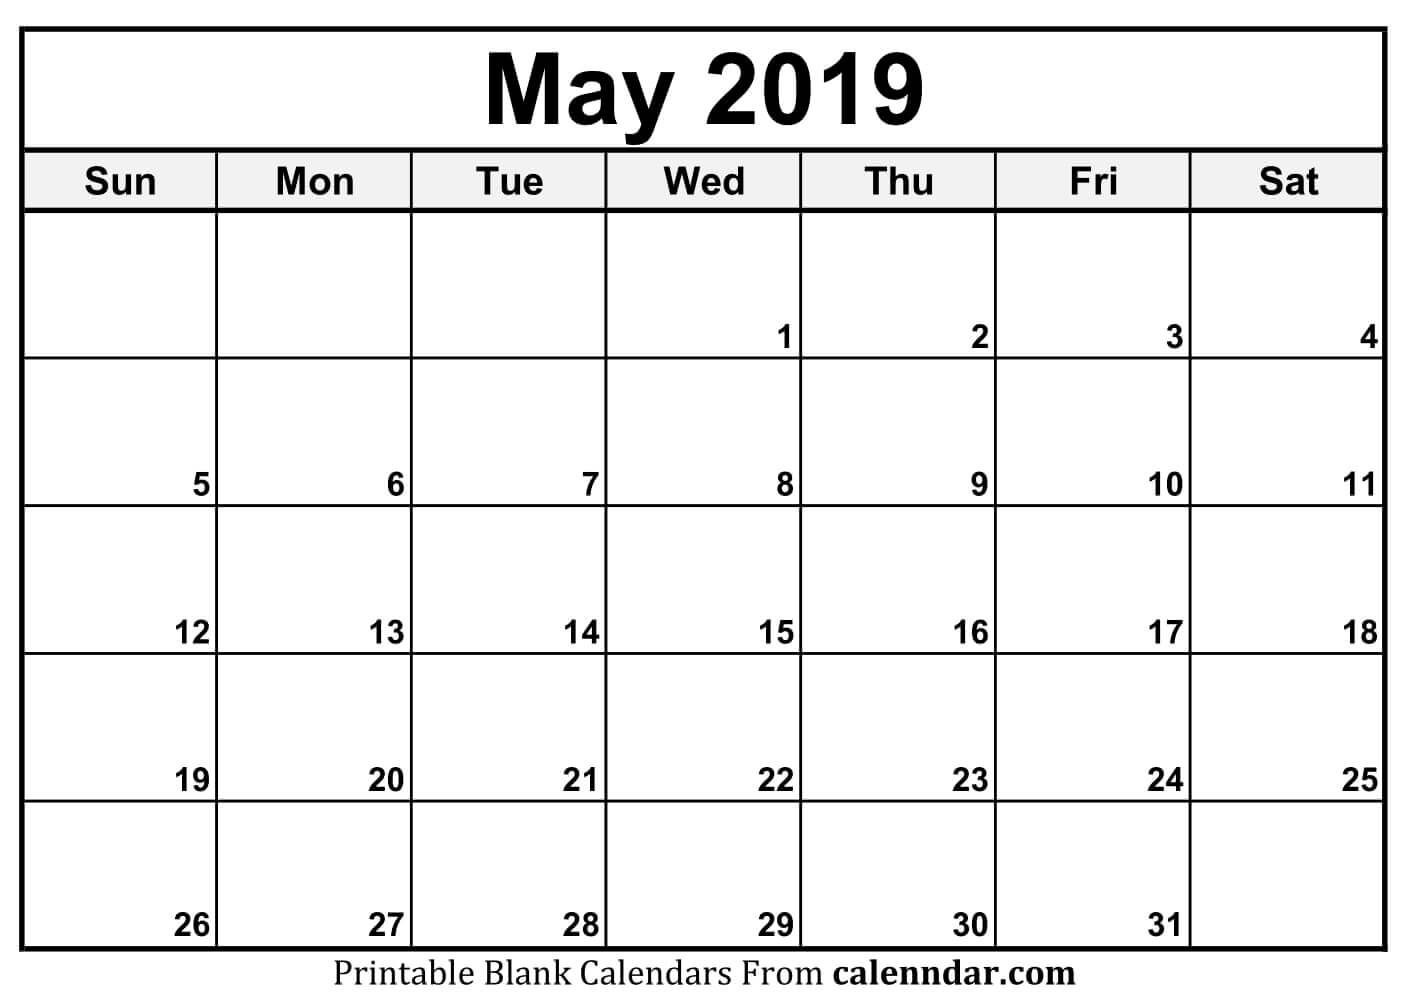 Blank May 2019 Calendar Templates – Calenndar Calendar May 4 2019